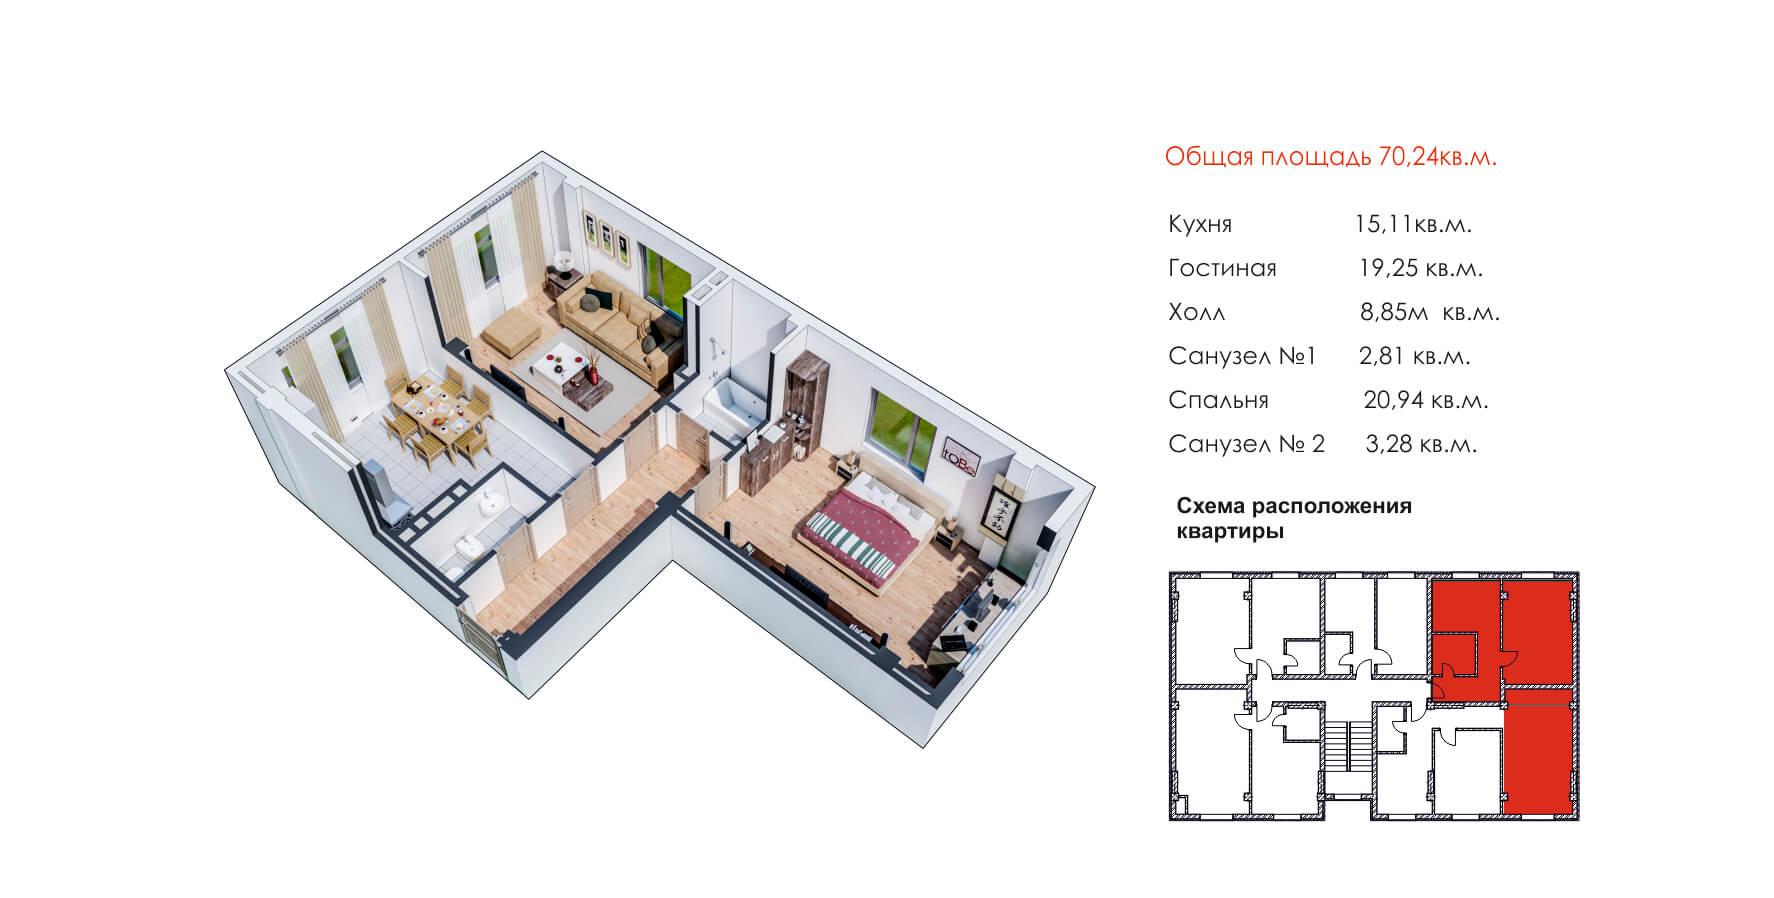 2-х комнатная квартира 70,24 кв.м.